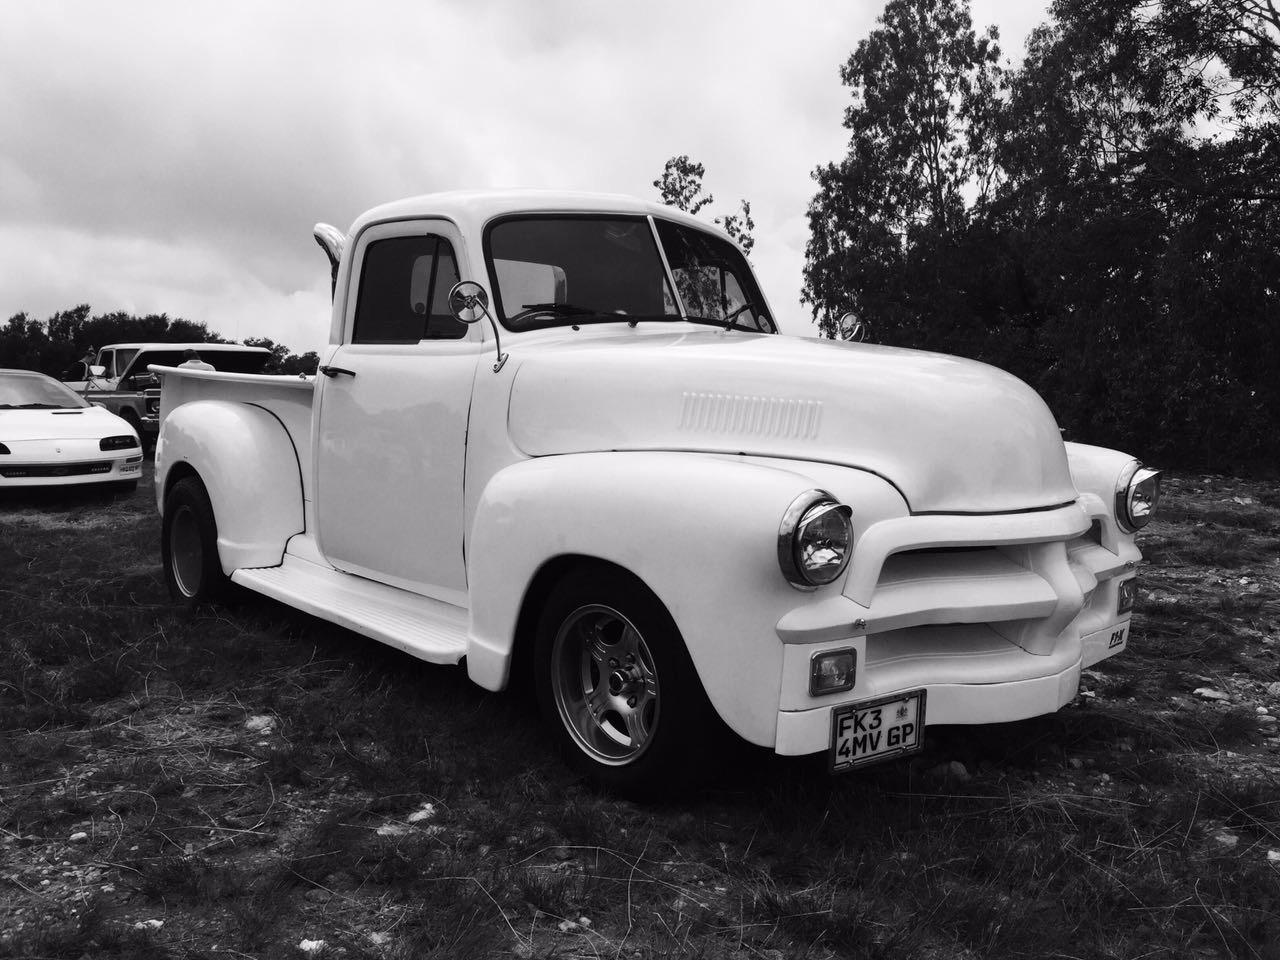 1954 Chevrolet Fleetline